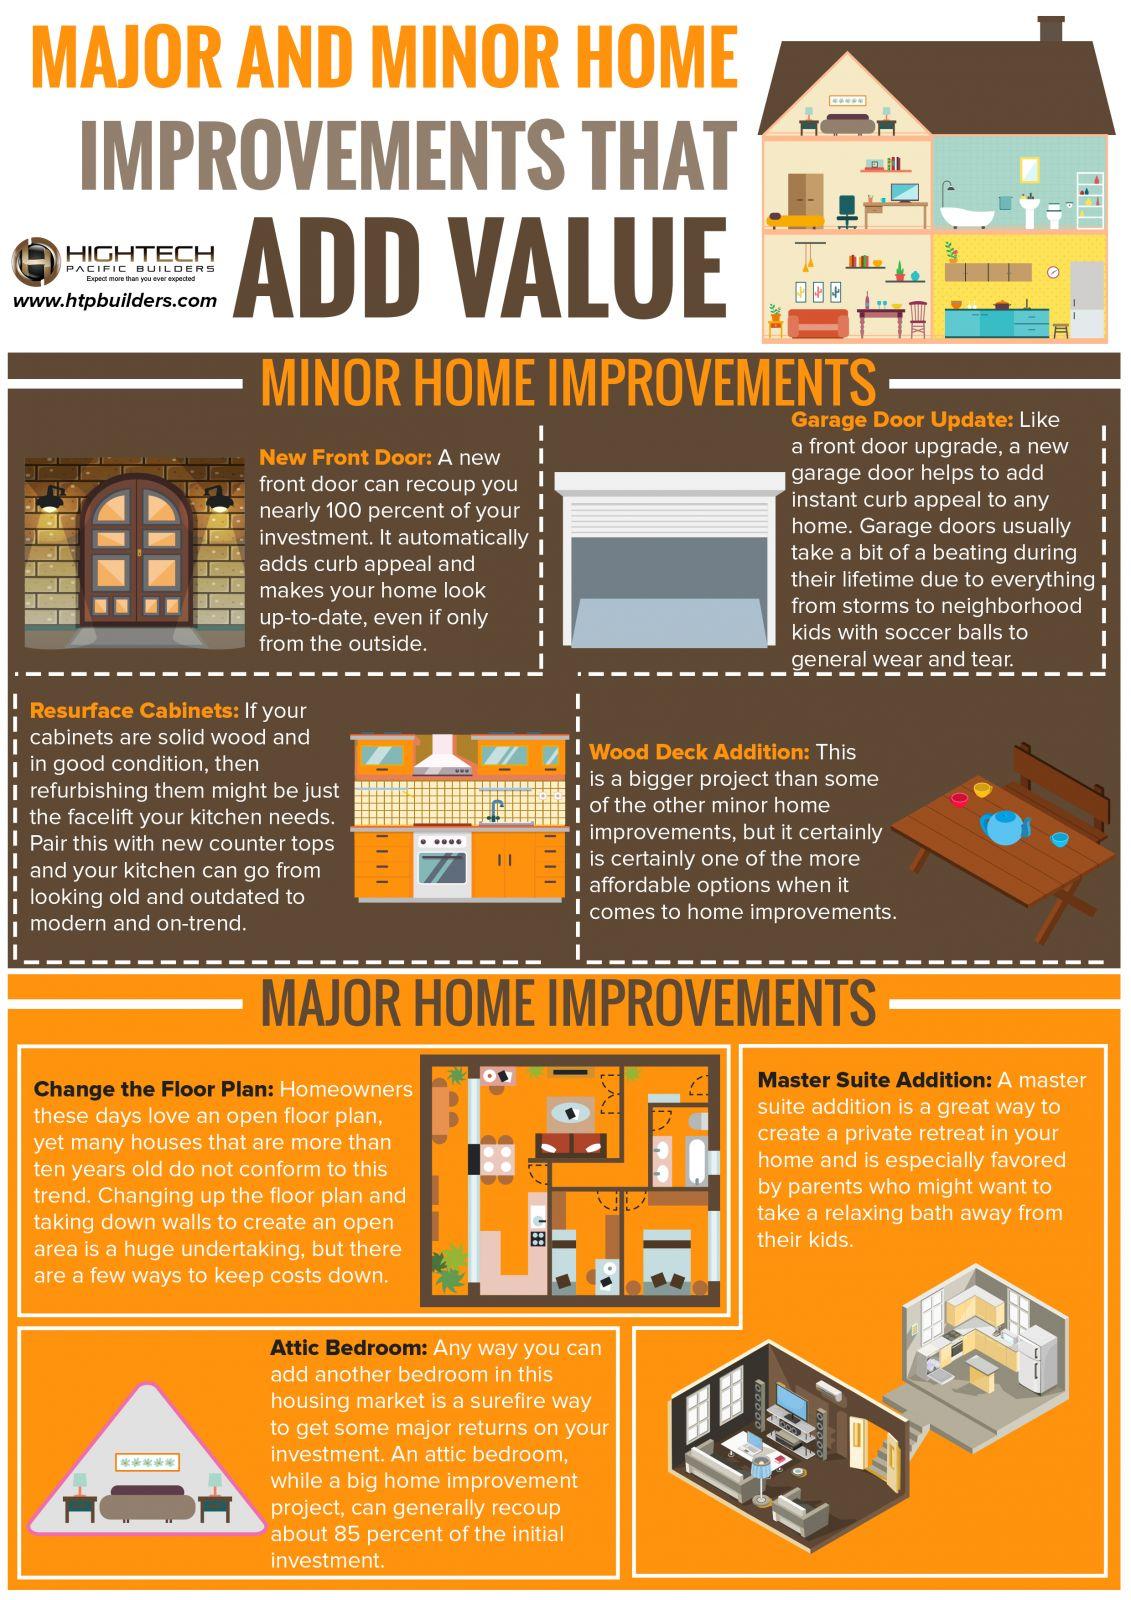 Improvements that add value